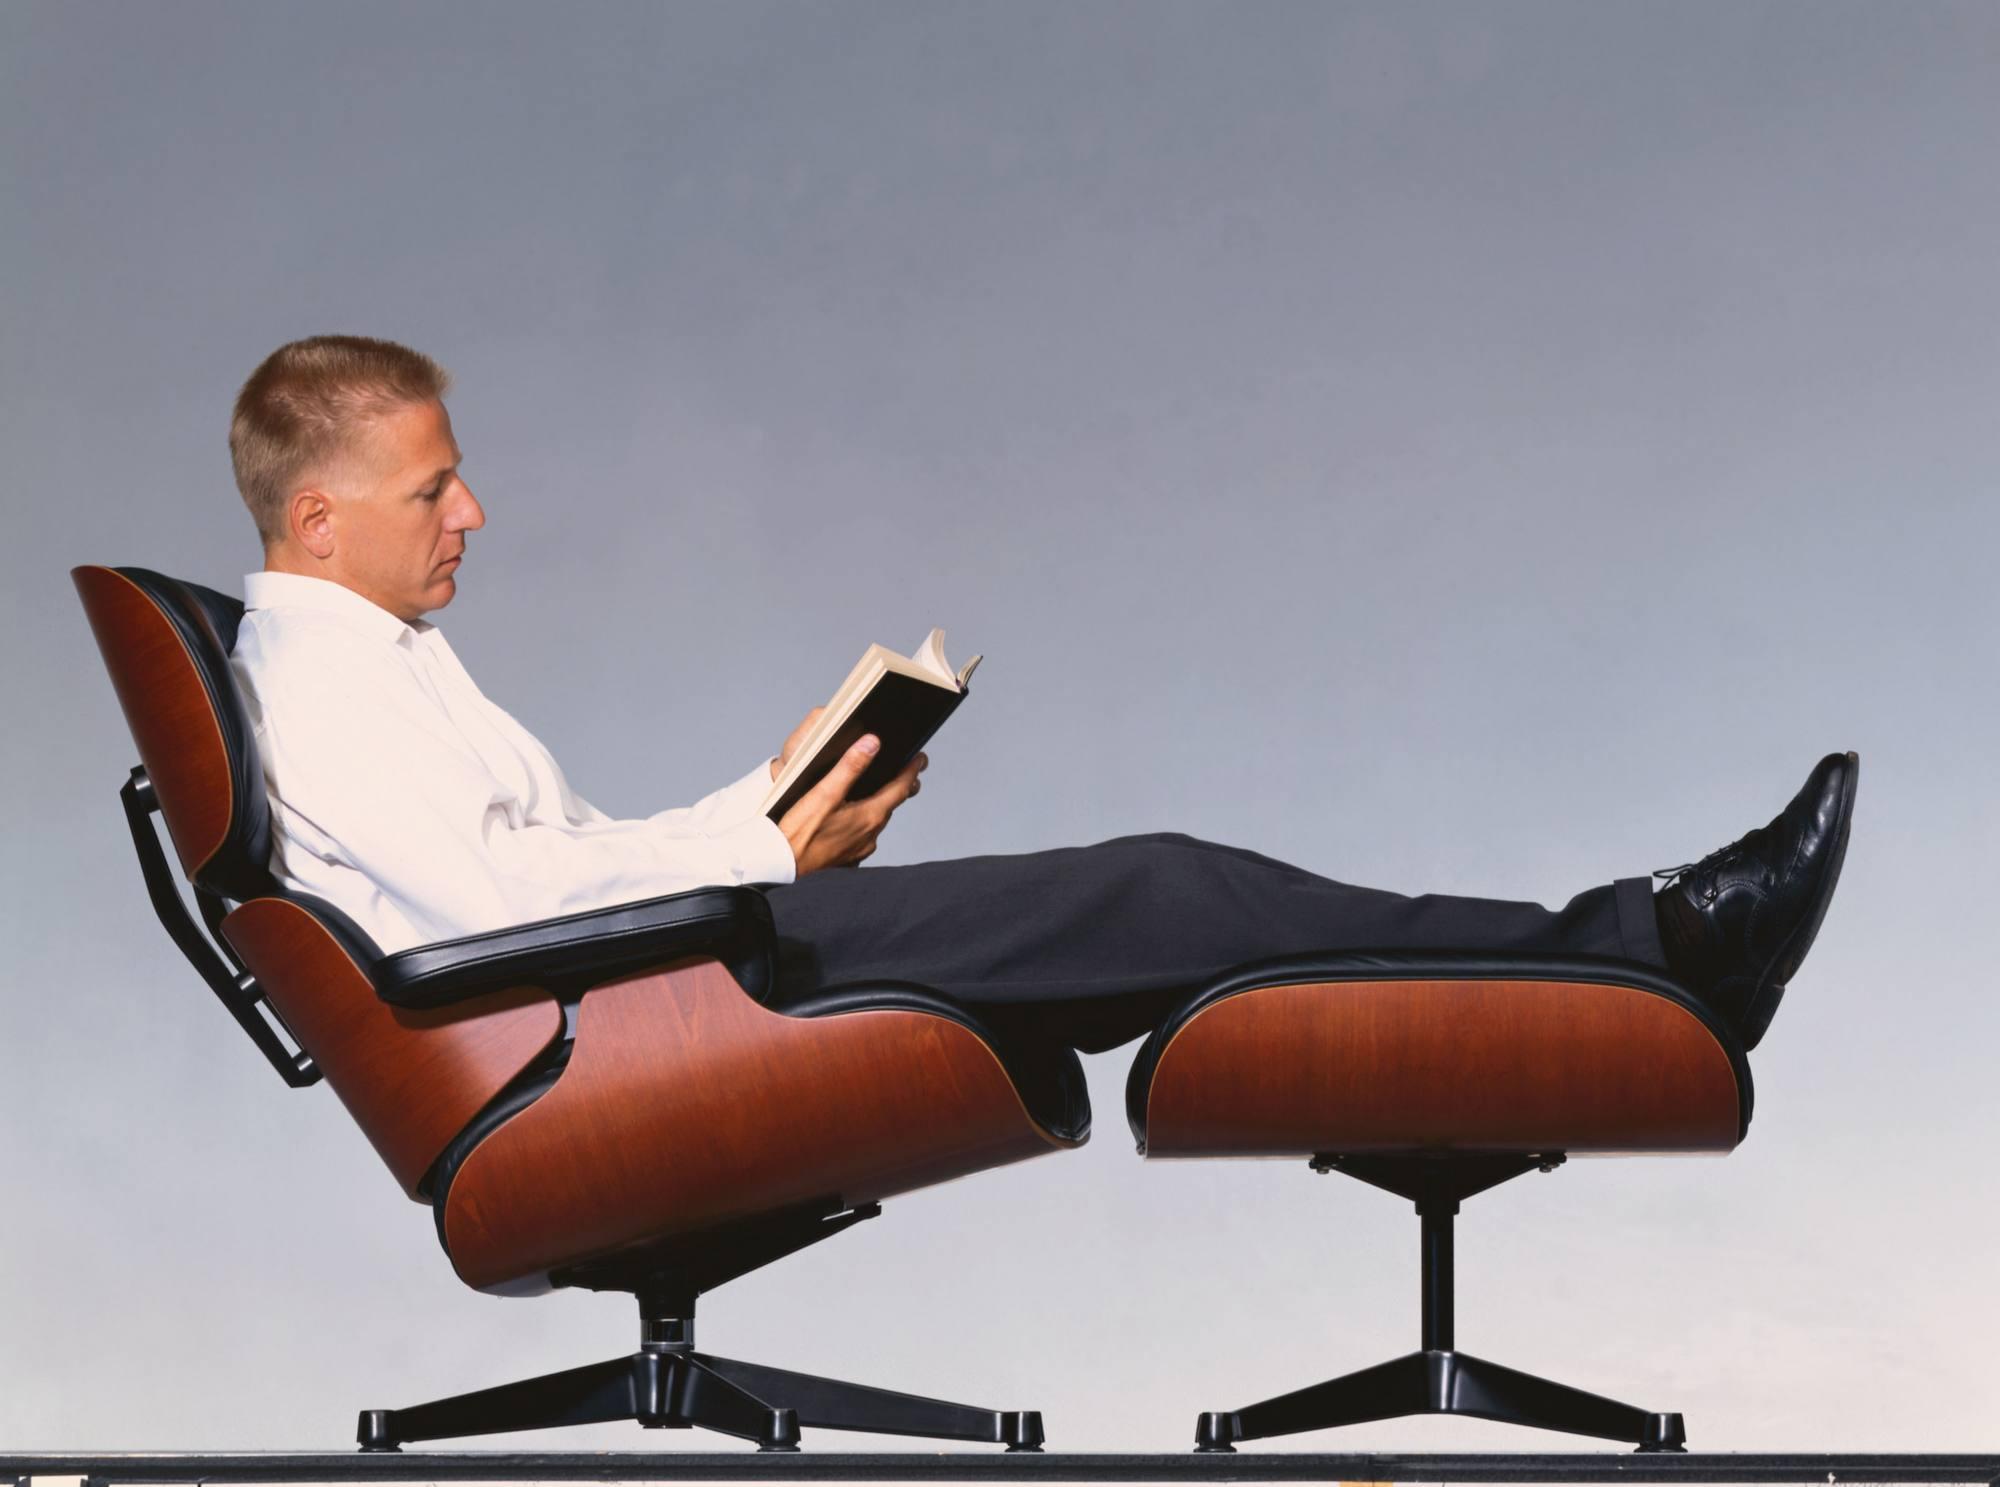 Eames Lounge Chair & Ottoman Sessel Vitra